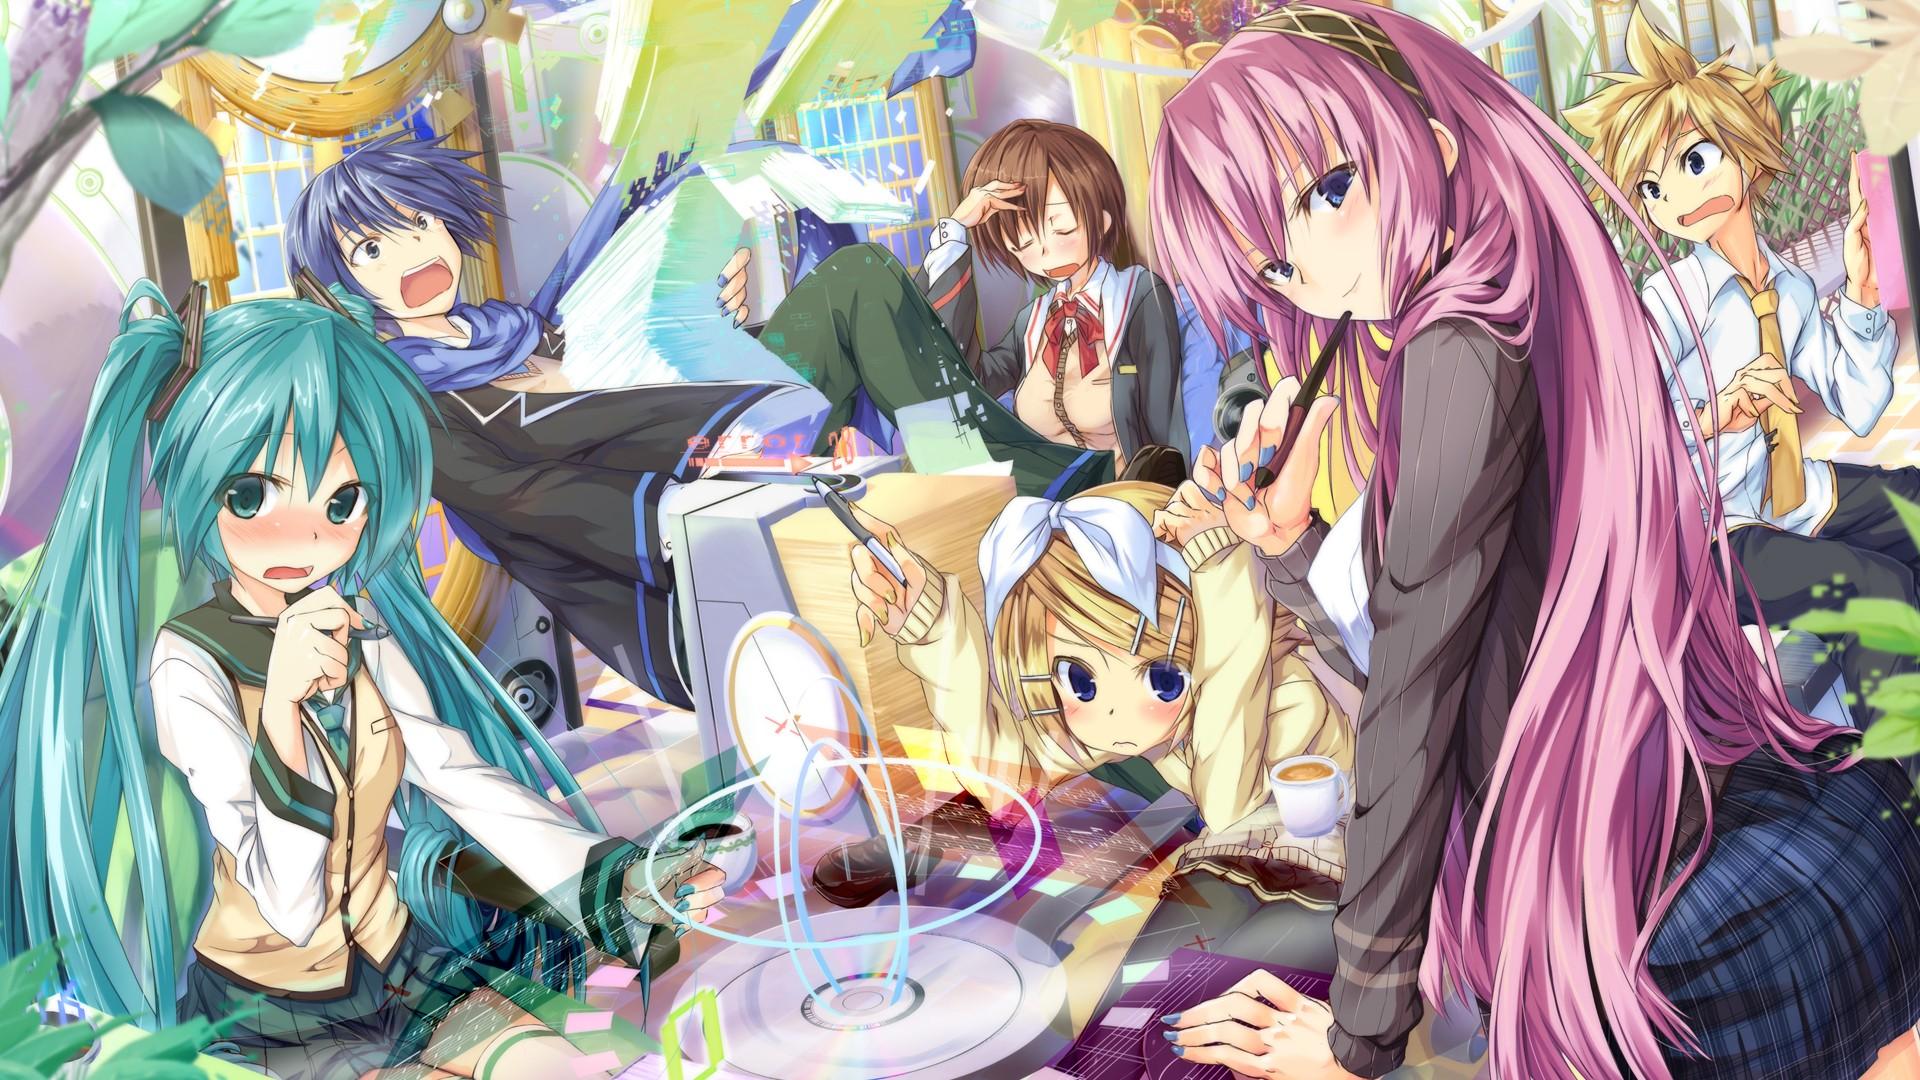 Papel de parede ilustra o Anime